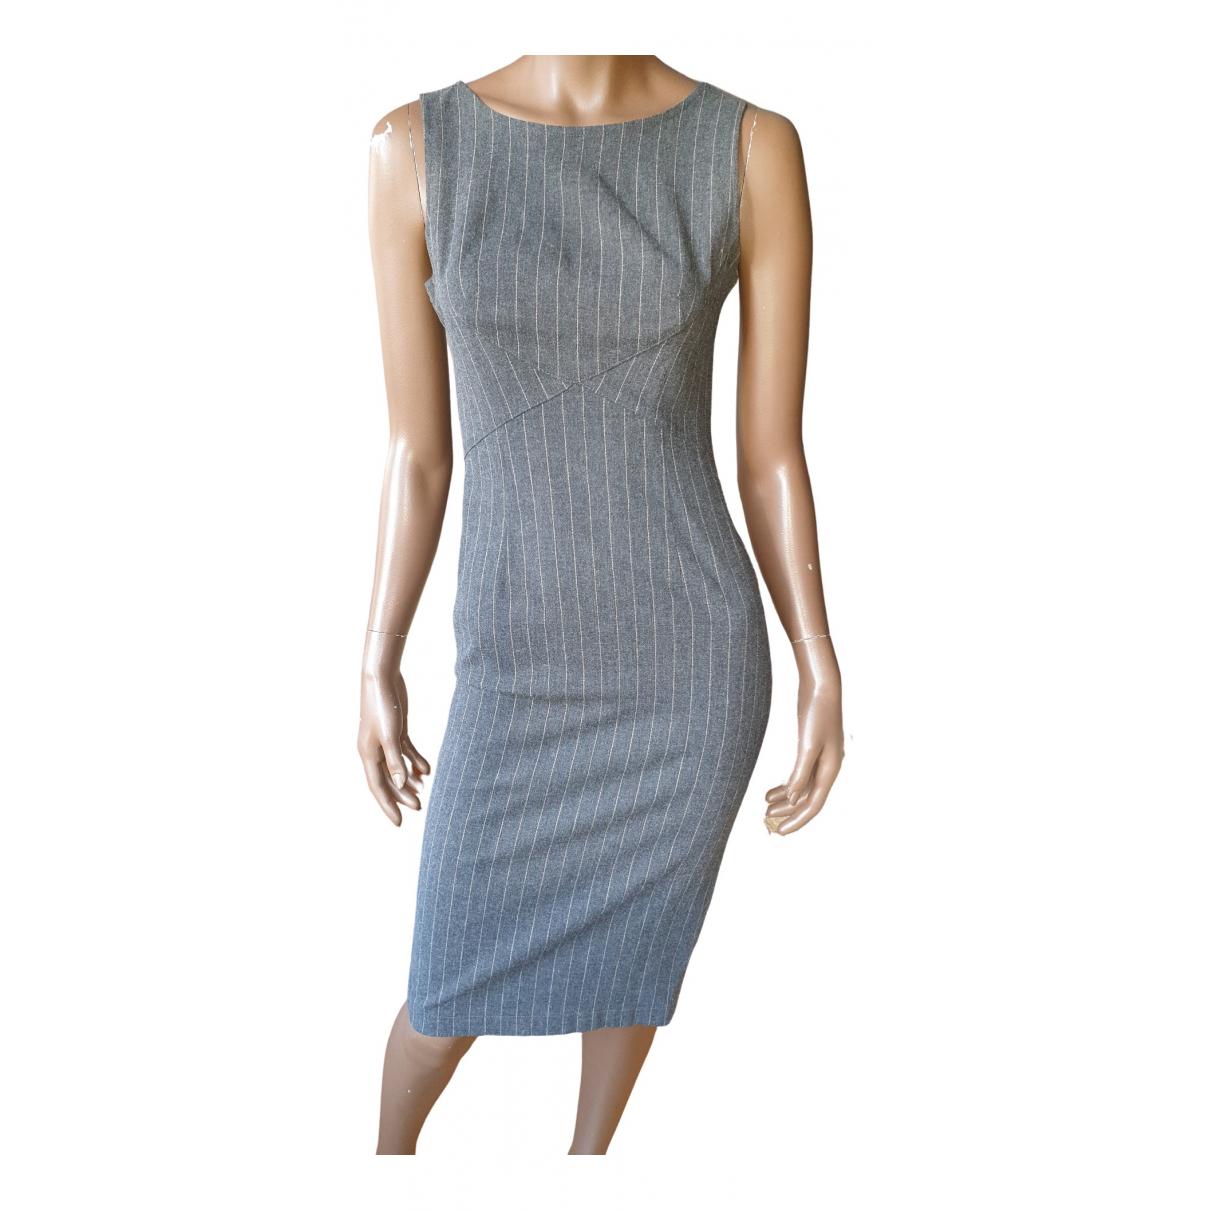 Moschino Cheap And Chic \N Kleid in  Grau Viskose